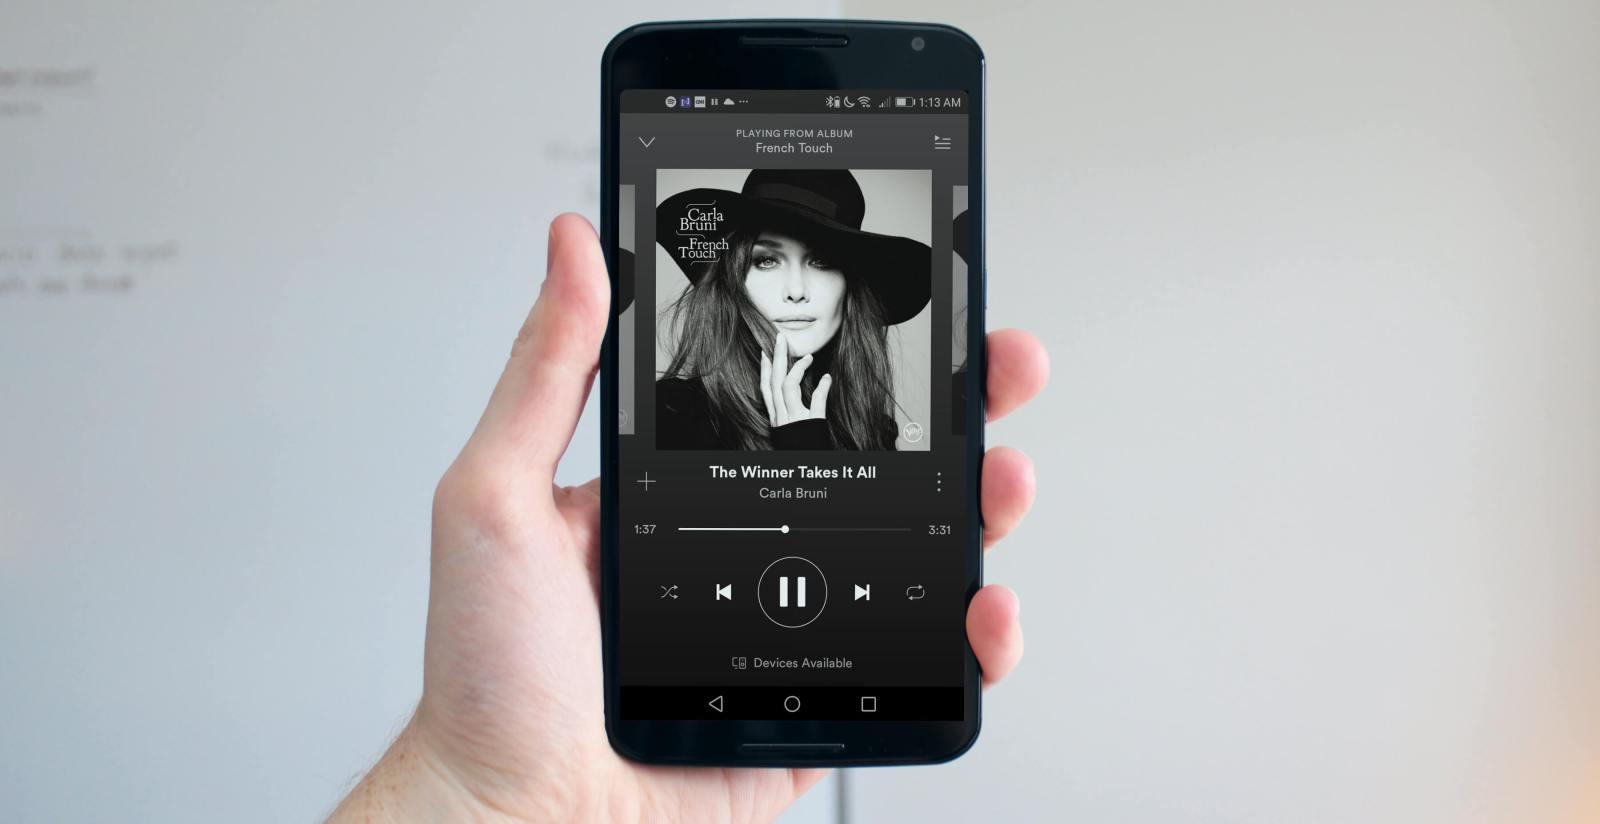 Spotify Carla Bruni